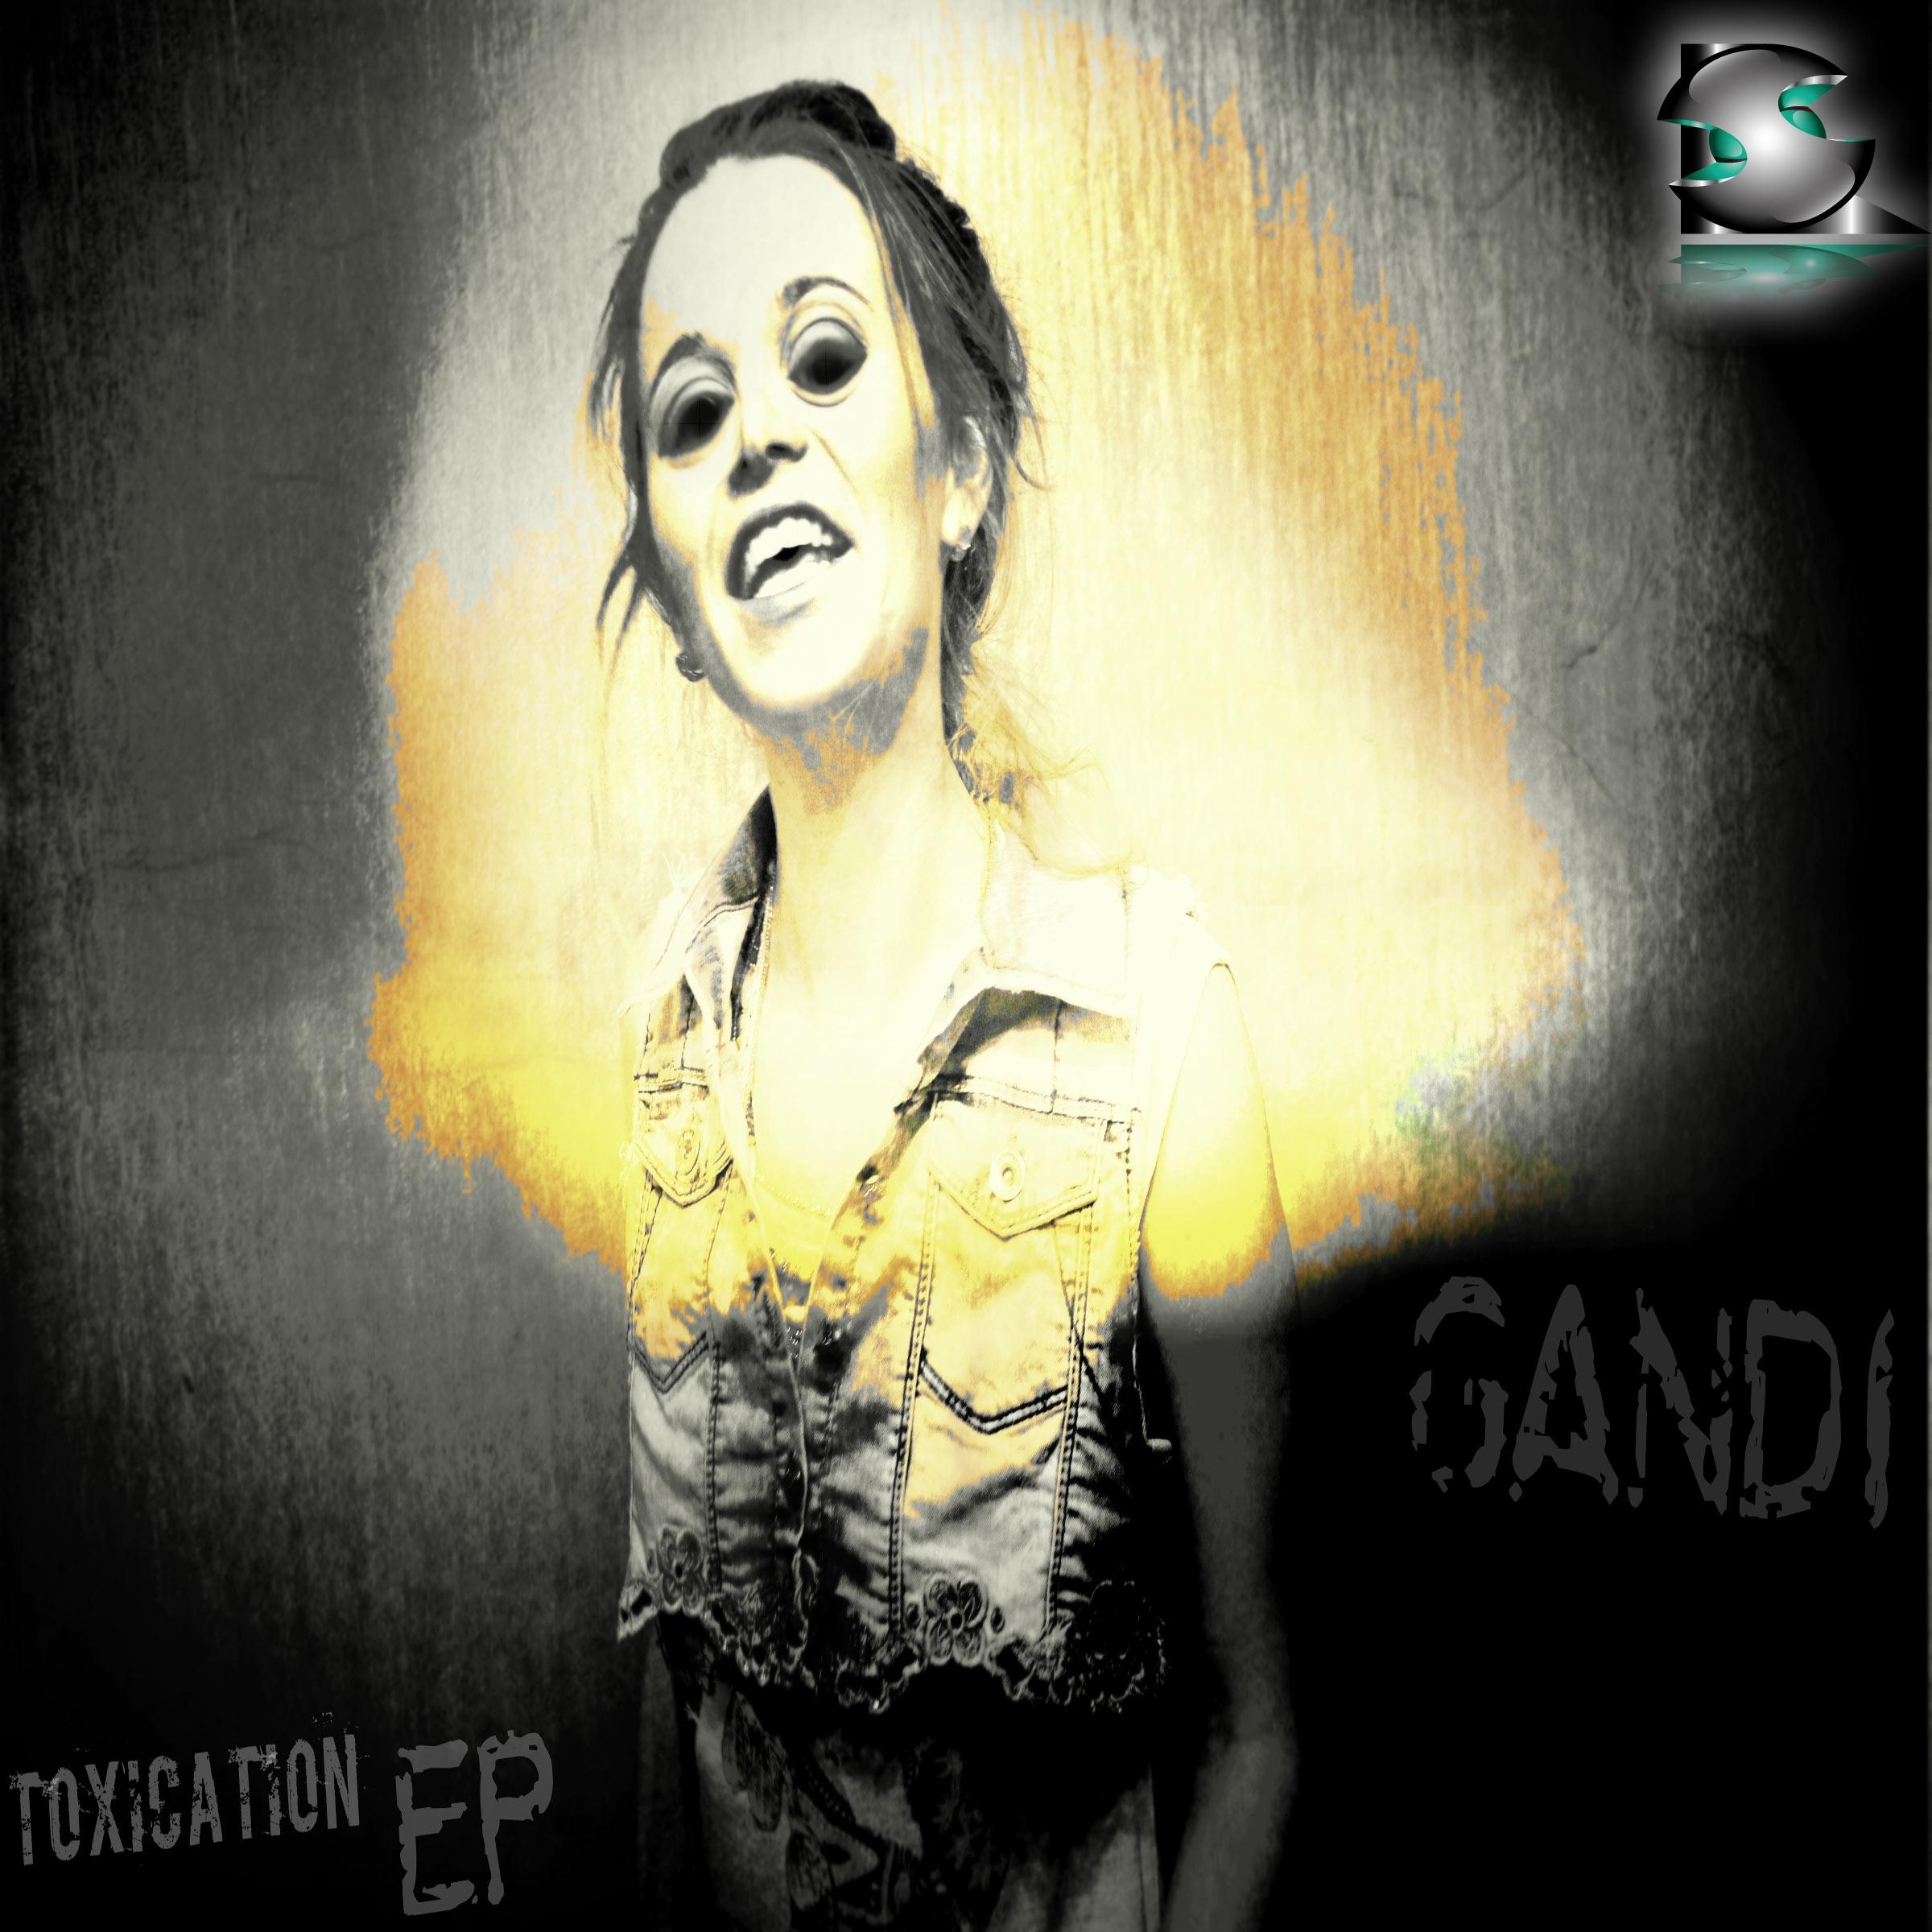 GANDI - Toxication (Original mix)